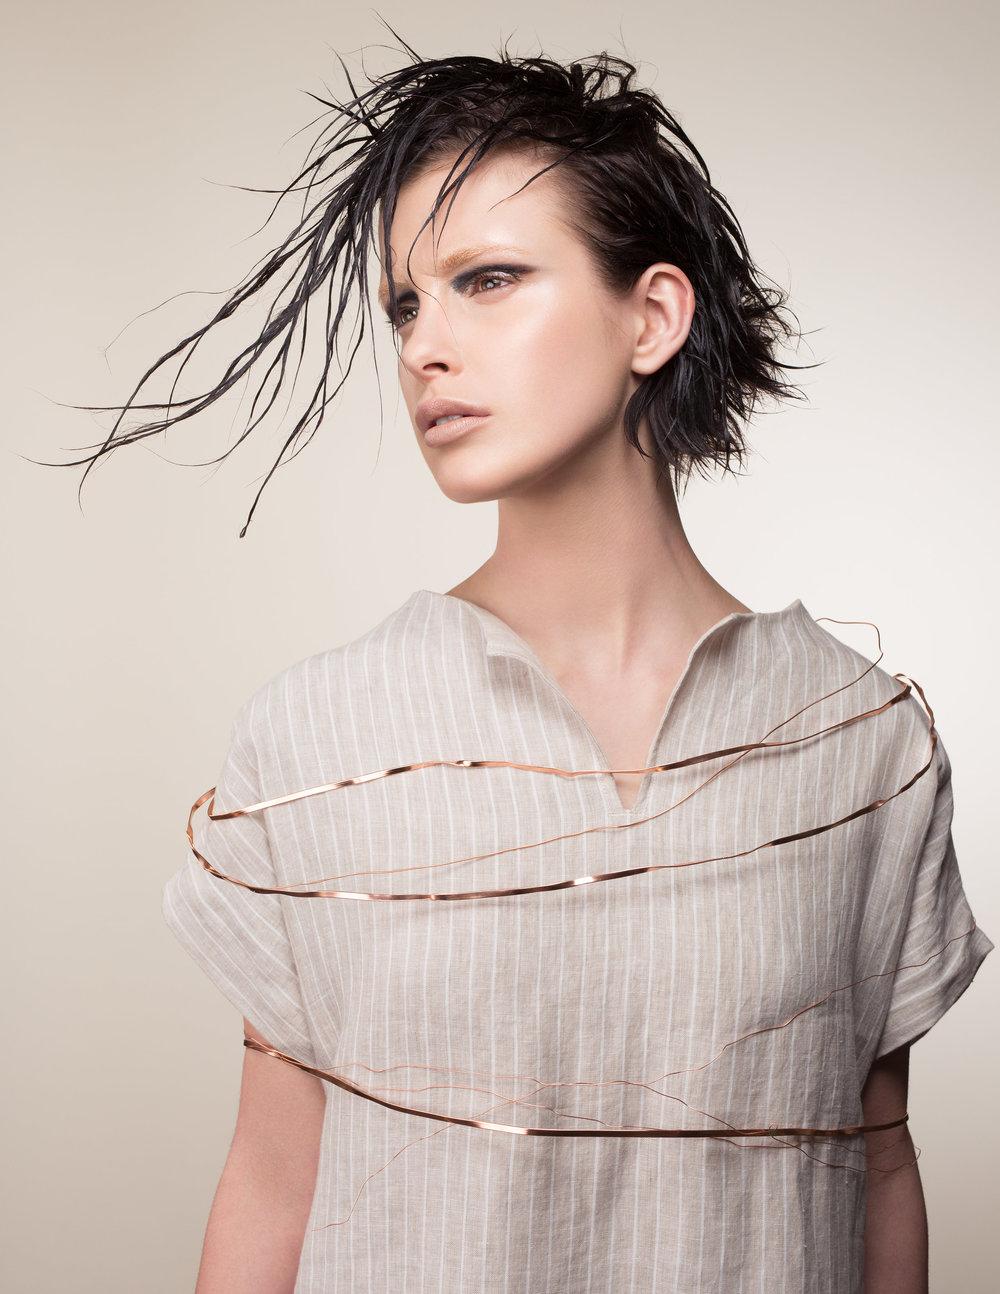 MODEL | Jade Nedilenka AGENCY | Edge Agency MUA | Sara Lindsay Makeup Artist MUA ASSIST | Lisa Hallam Makeup Artistry HAIR STYLIST | Alicia Soulier WARDROBE | Tonic Saskatoon + Cedar & Vine STYLING ASSIST | Justine Romanoff PHOTOGRAPHY, STYLING, RETOUCH | Nicole Romanoff PHOTO ASSIST | S.J. Kardash LOCATION | Saskatoon, SK